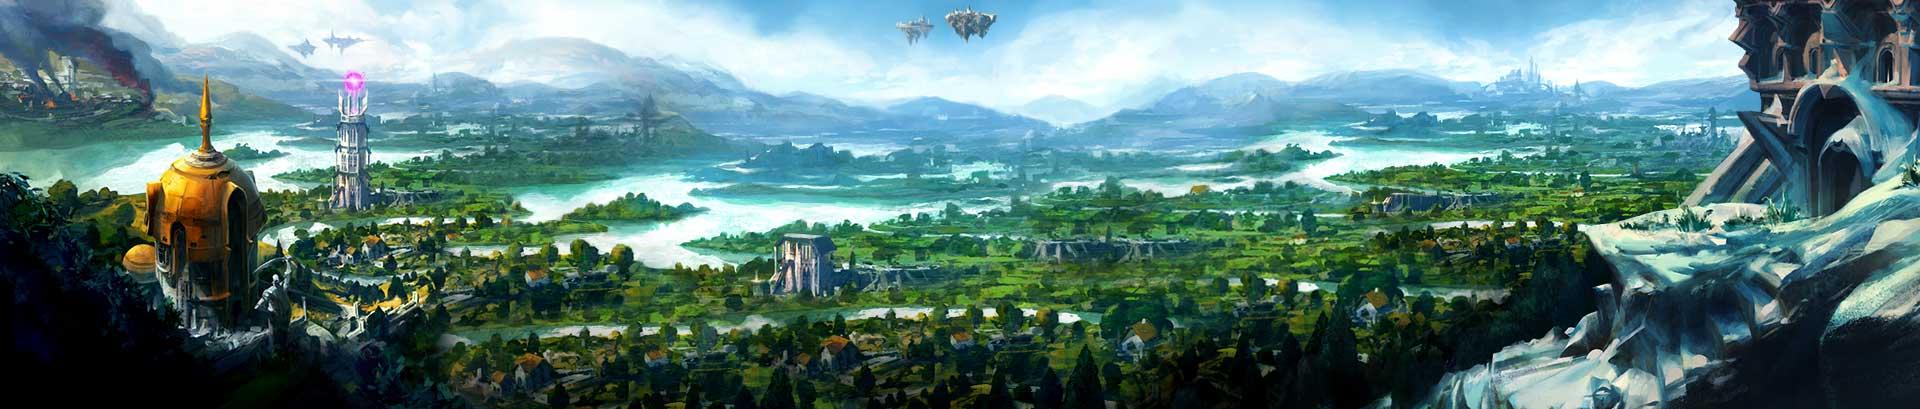 RuneScape-Landschaftsbild